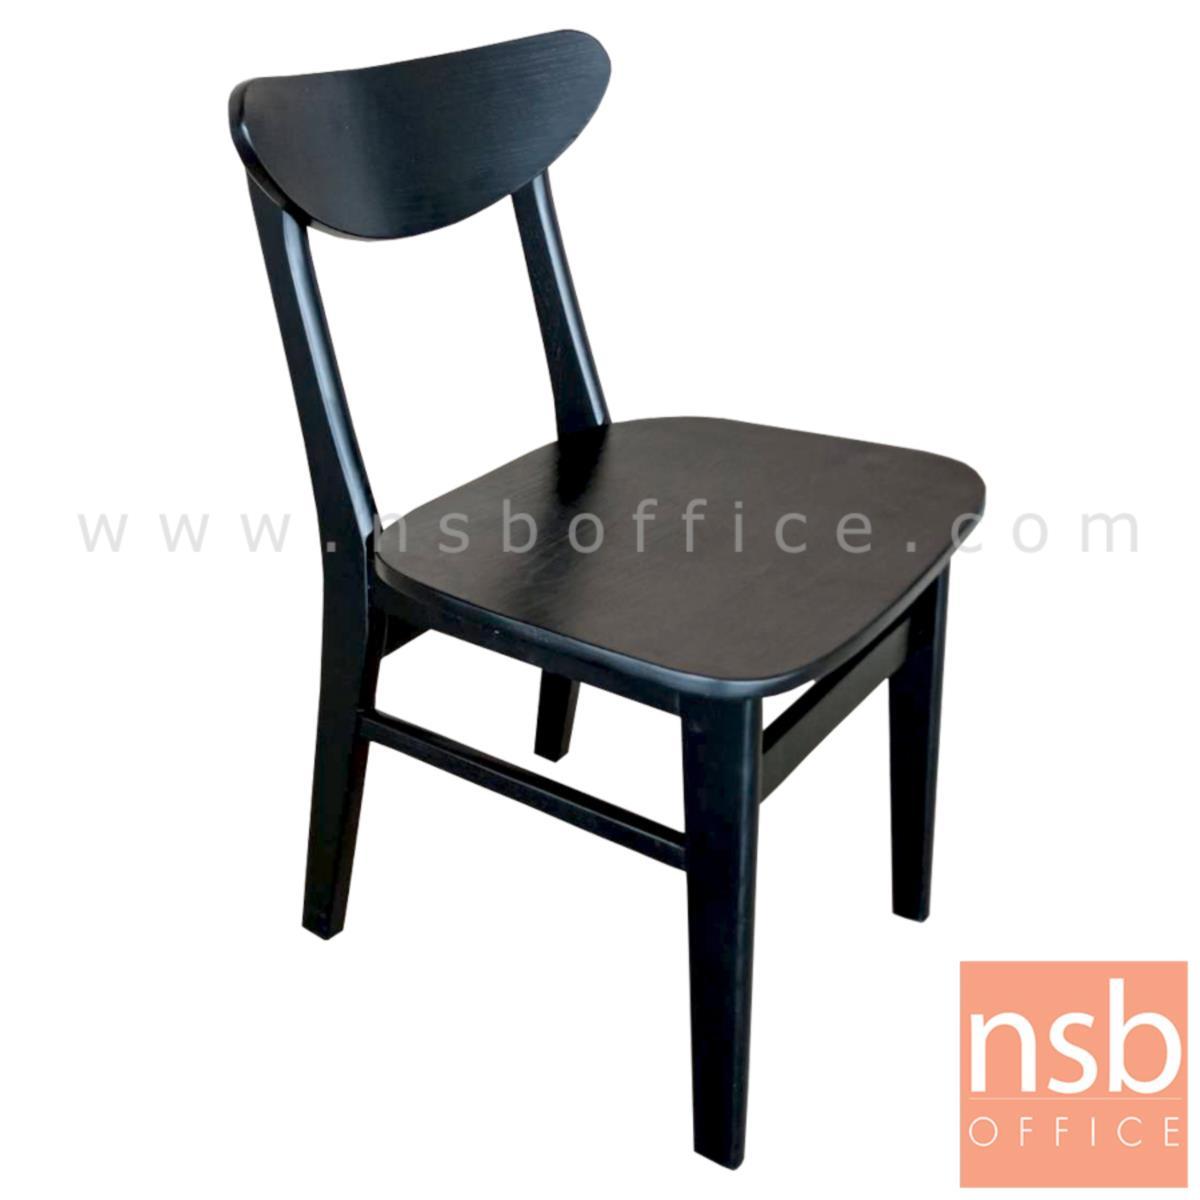 B29A316:เก้าอี้โมเดิร์นไม้ รุ่น Goodrem (กูดเดร็ม) ขนาด 44W cm. โครงไม้ล้วน สีดำ